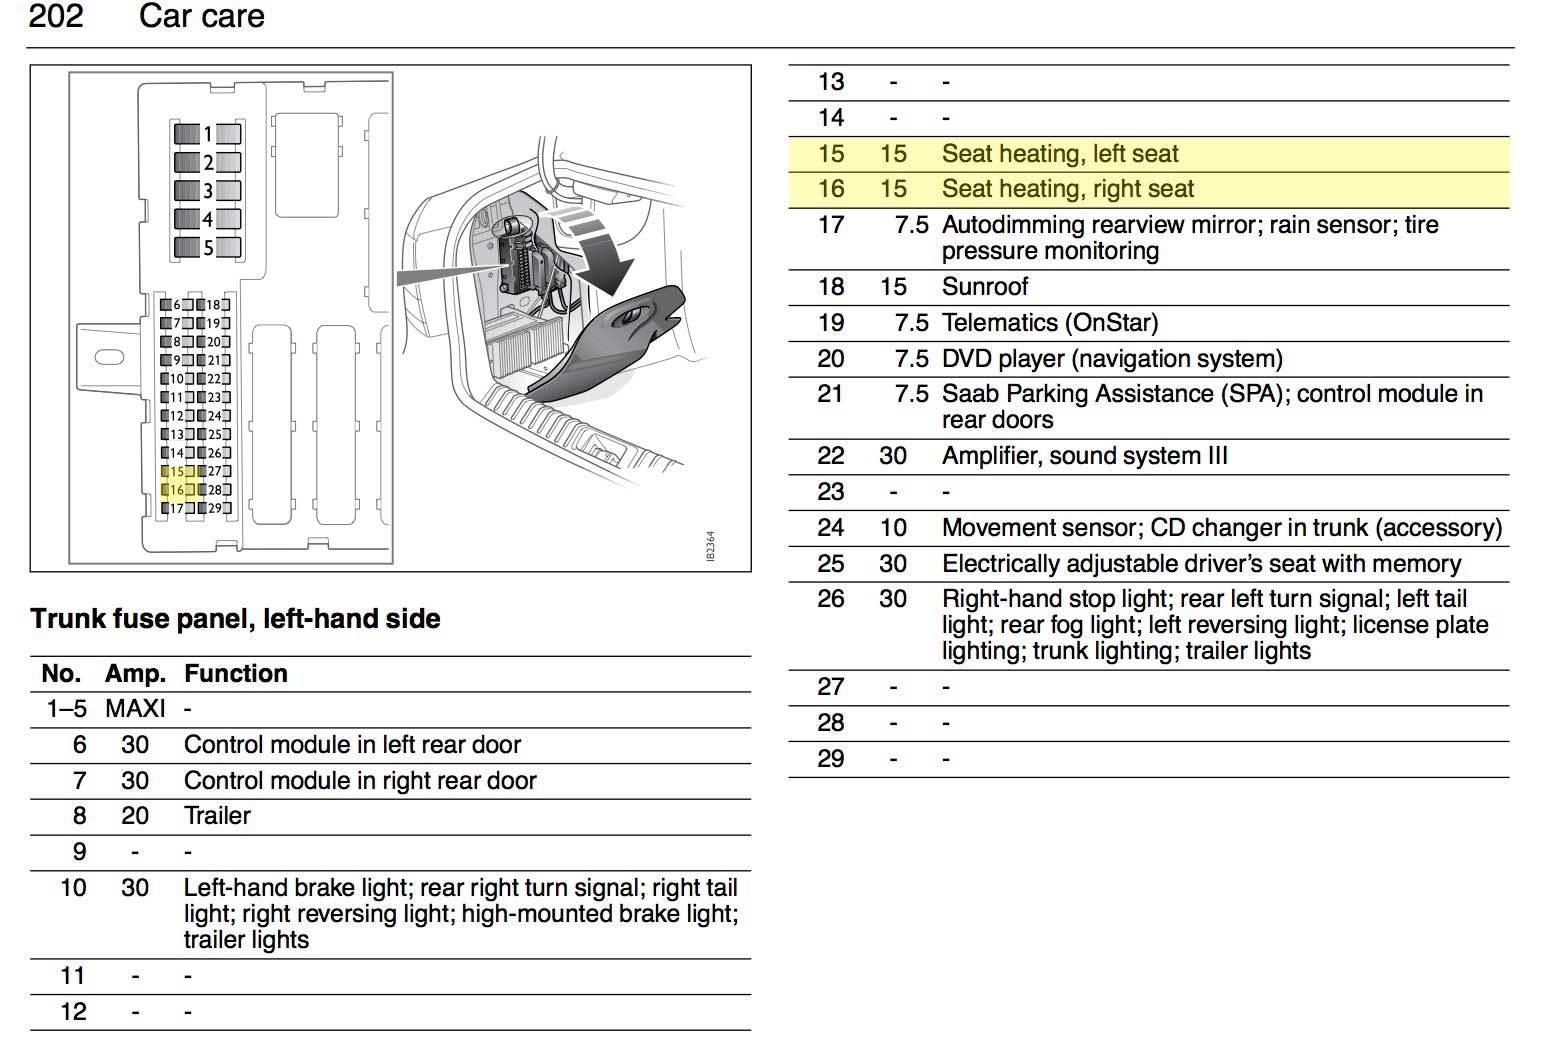 Amazing 2001 Saab 9 5 Fuse Box Diagram Wiring Diagram Wiring Cloud Itislusmarecoveryedborg